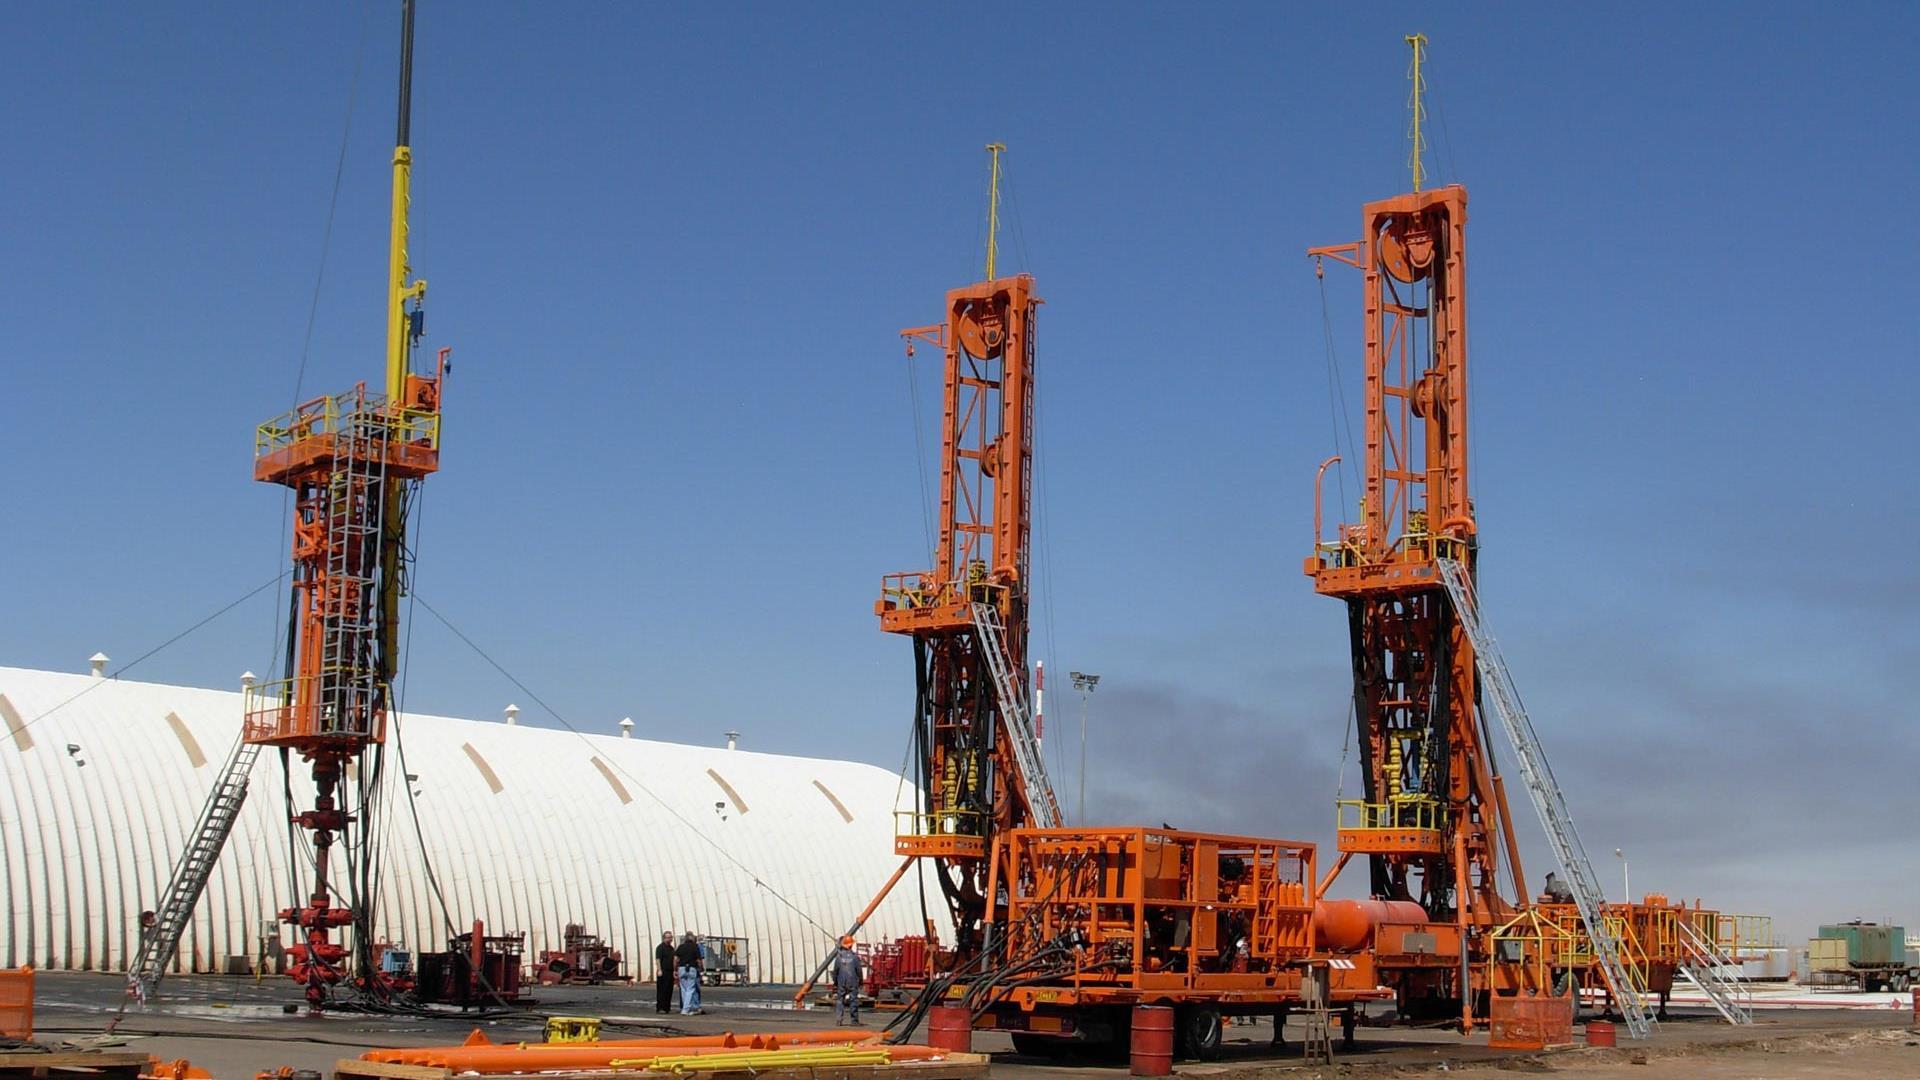 Hydra Rig Snubbing Unit on site